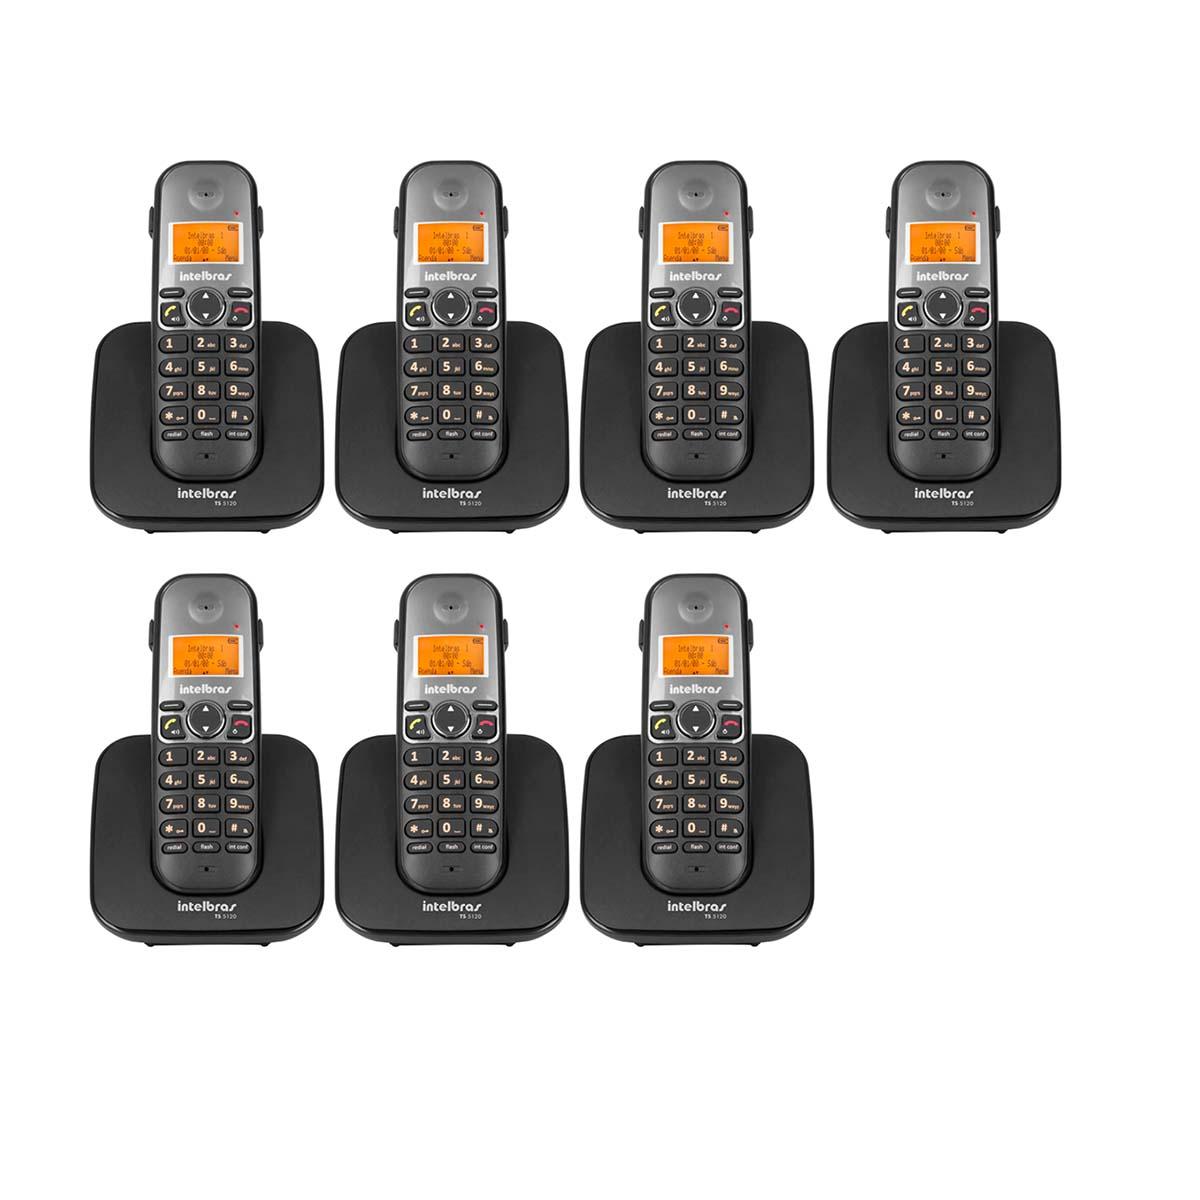 Kit 07 Telefone Sem Fio Intelbras Ts 5120